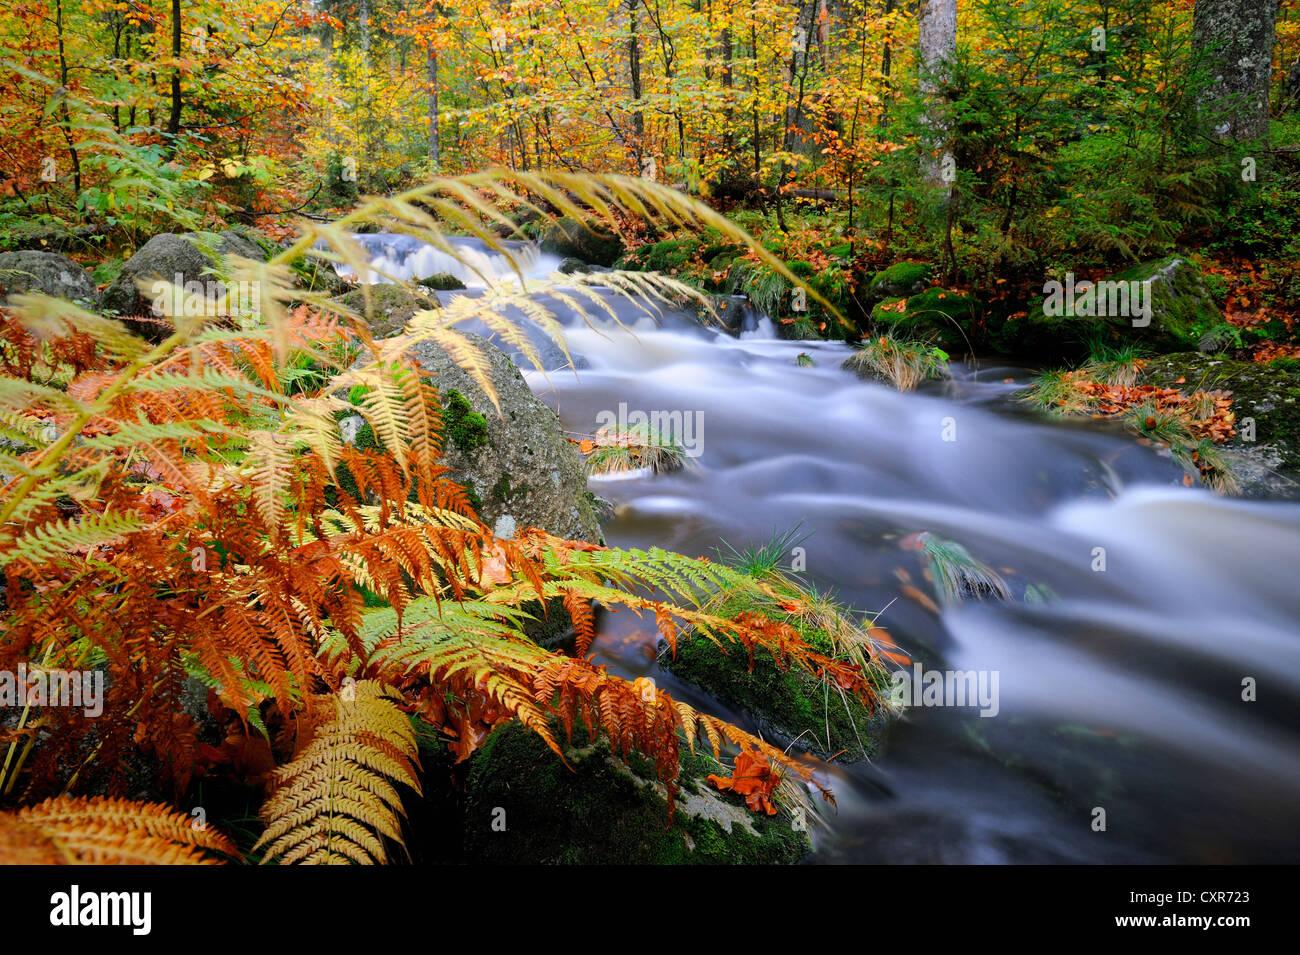 Mountain stream with autumn leaves, Bavarian Forest, Grafenau, Bavaria, Germany, Europe - Stock Image